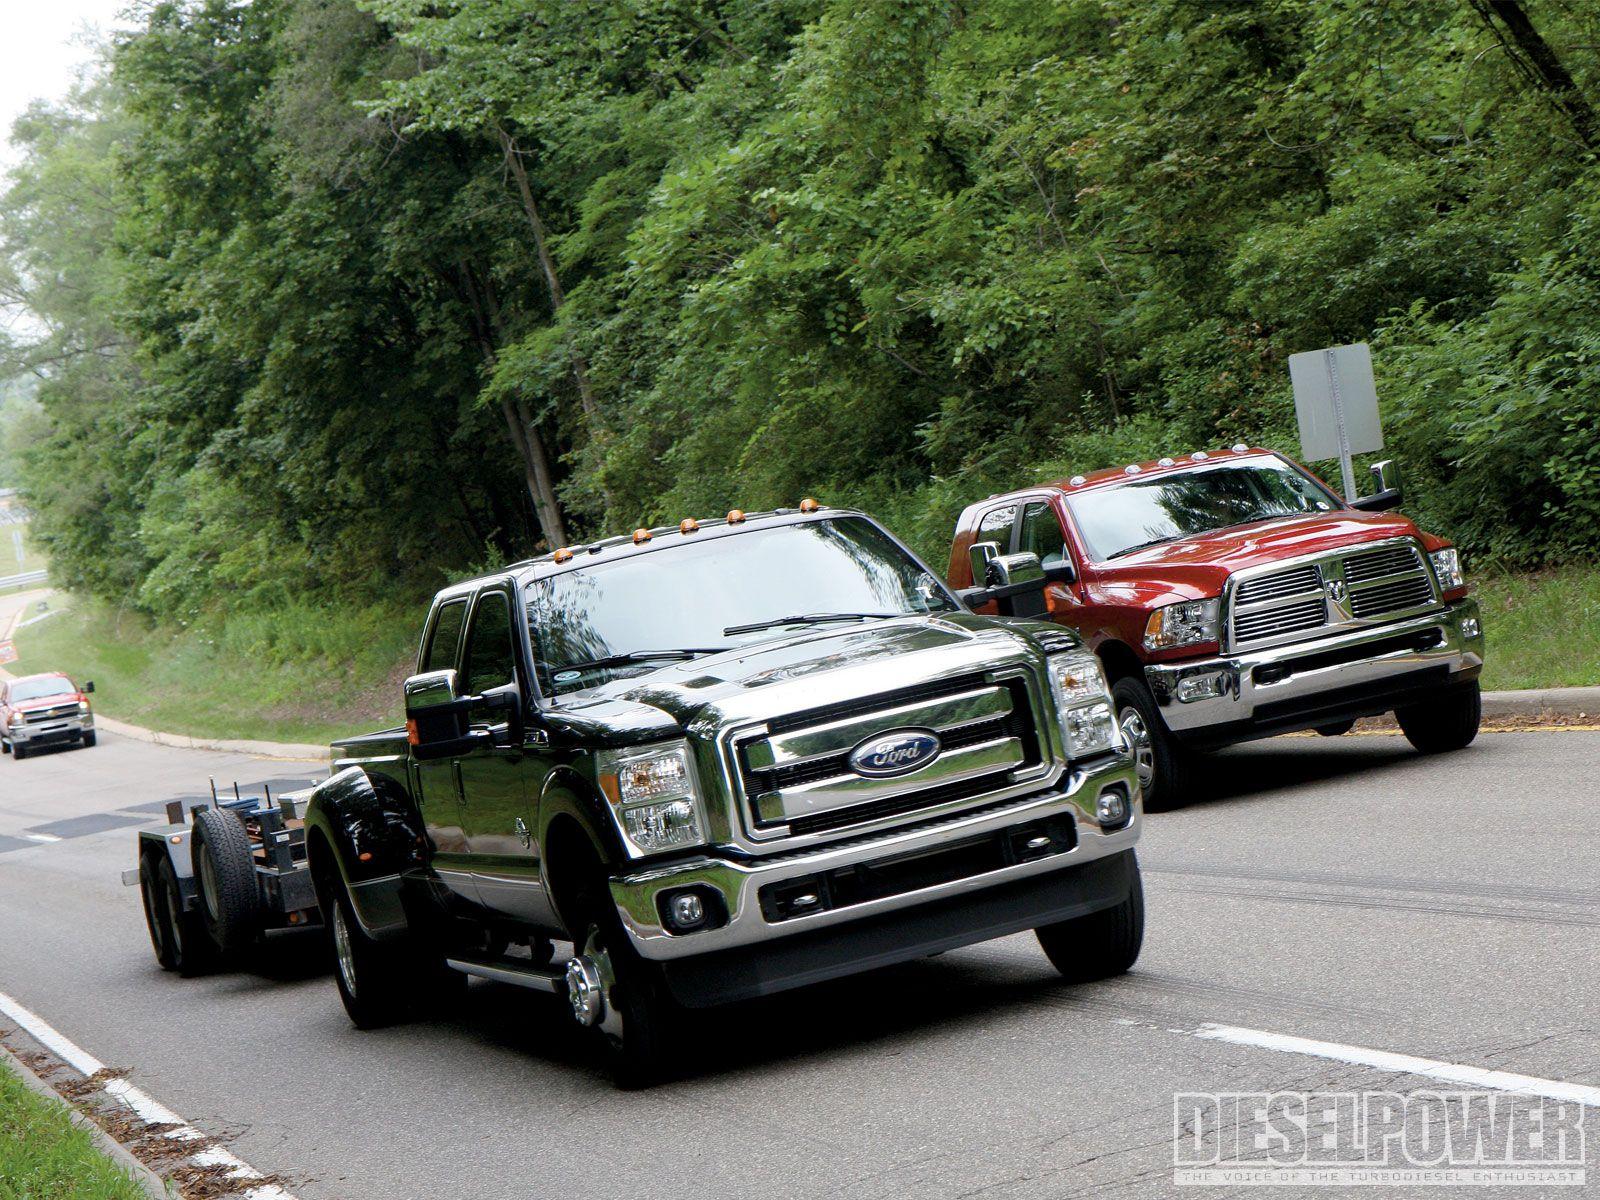 2020 trucks chevy ford dodge 1010dp 2011 ford vs ram vs gm diesel trucks f350